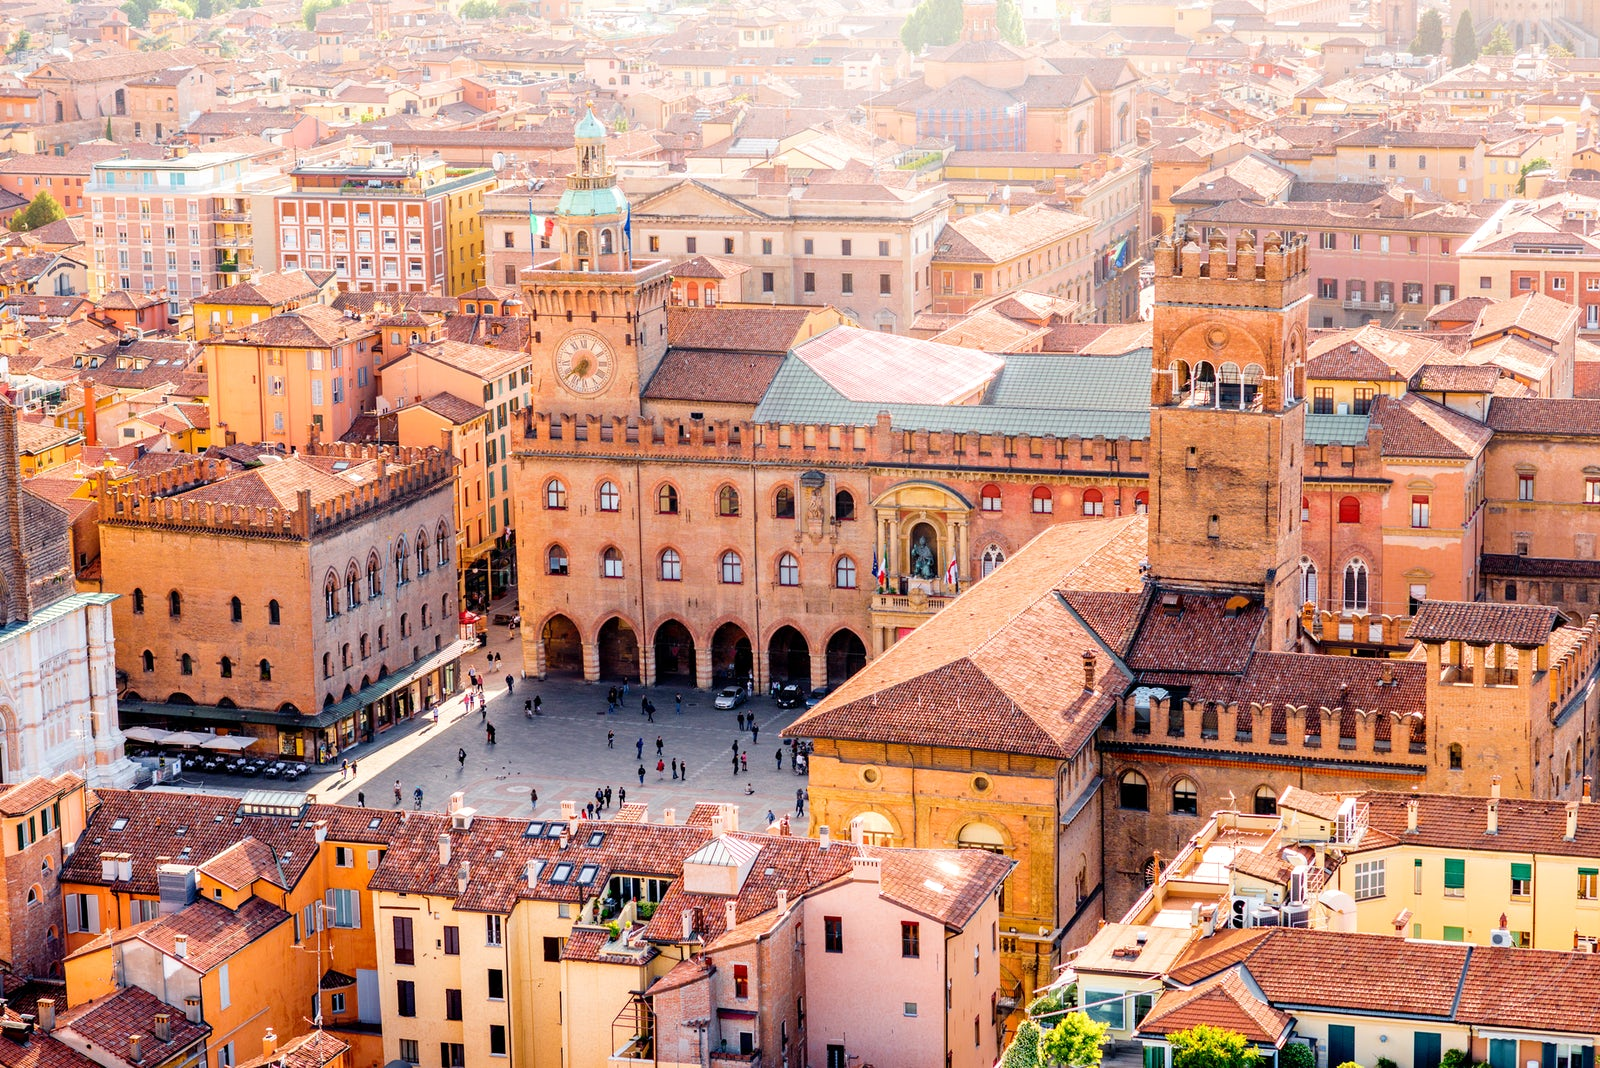 !i18n:en:data.cities:bologna.picture.caption